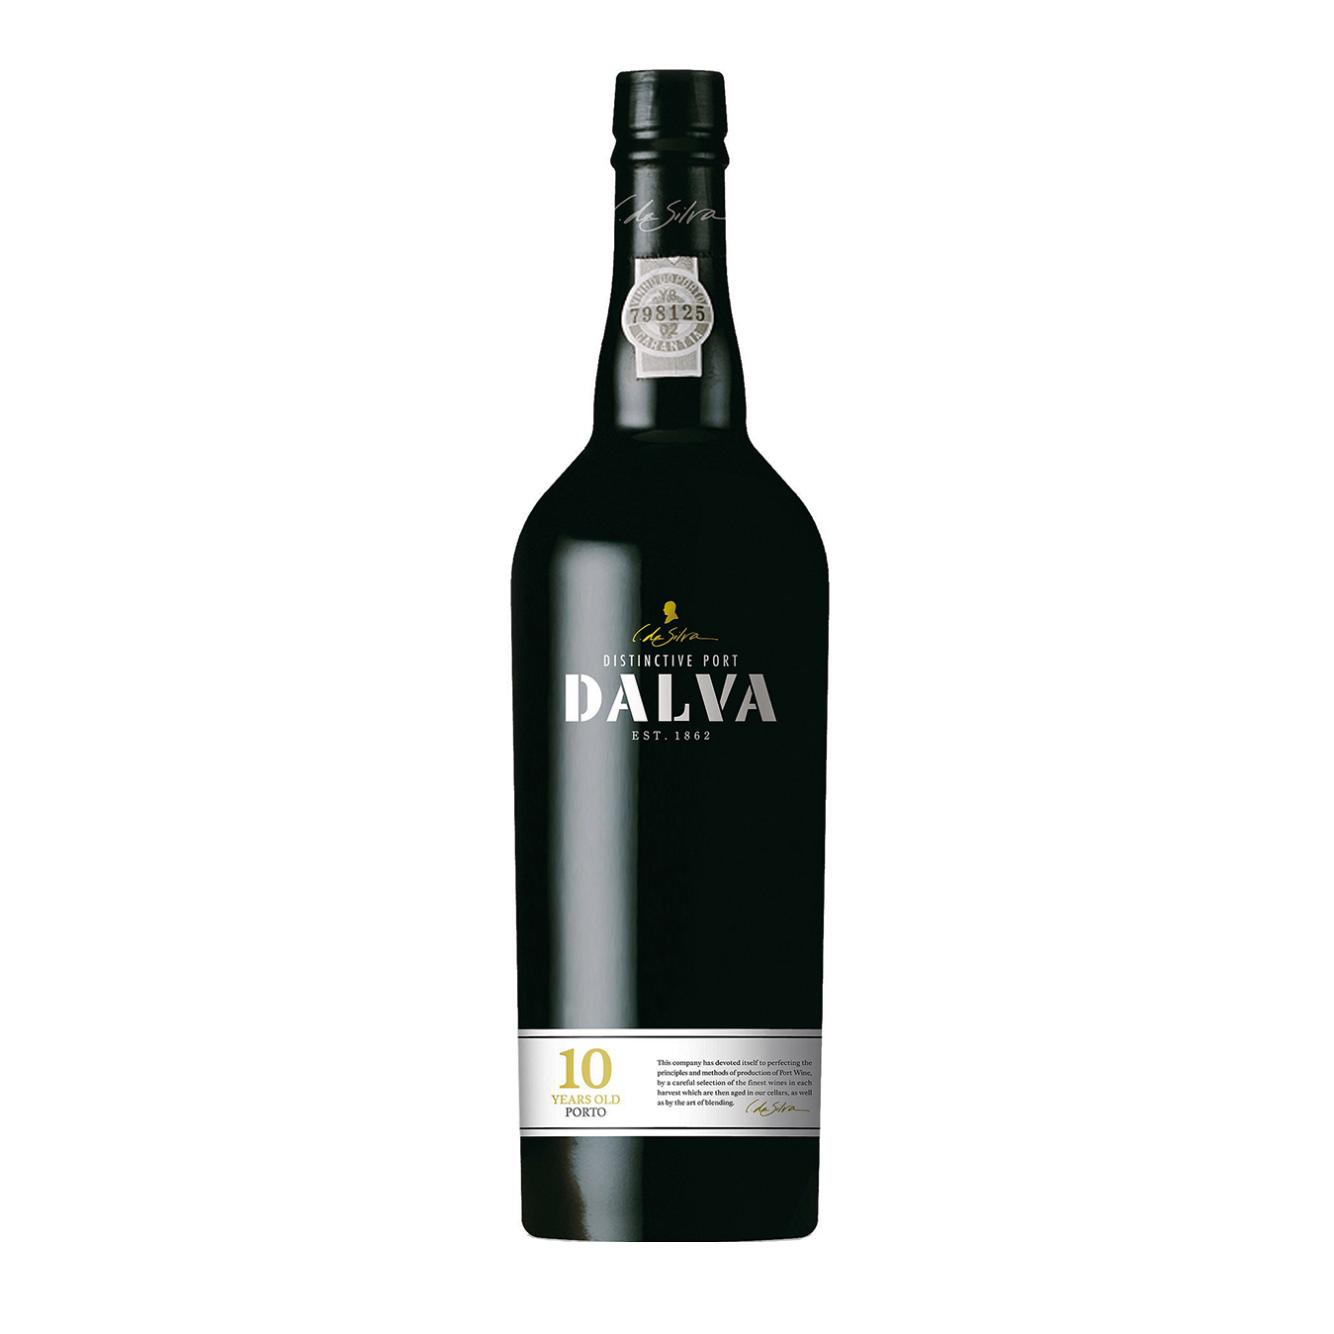 Dalva 10yr Old Port